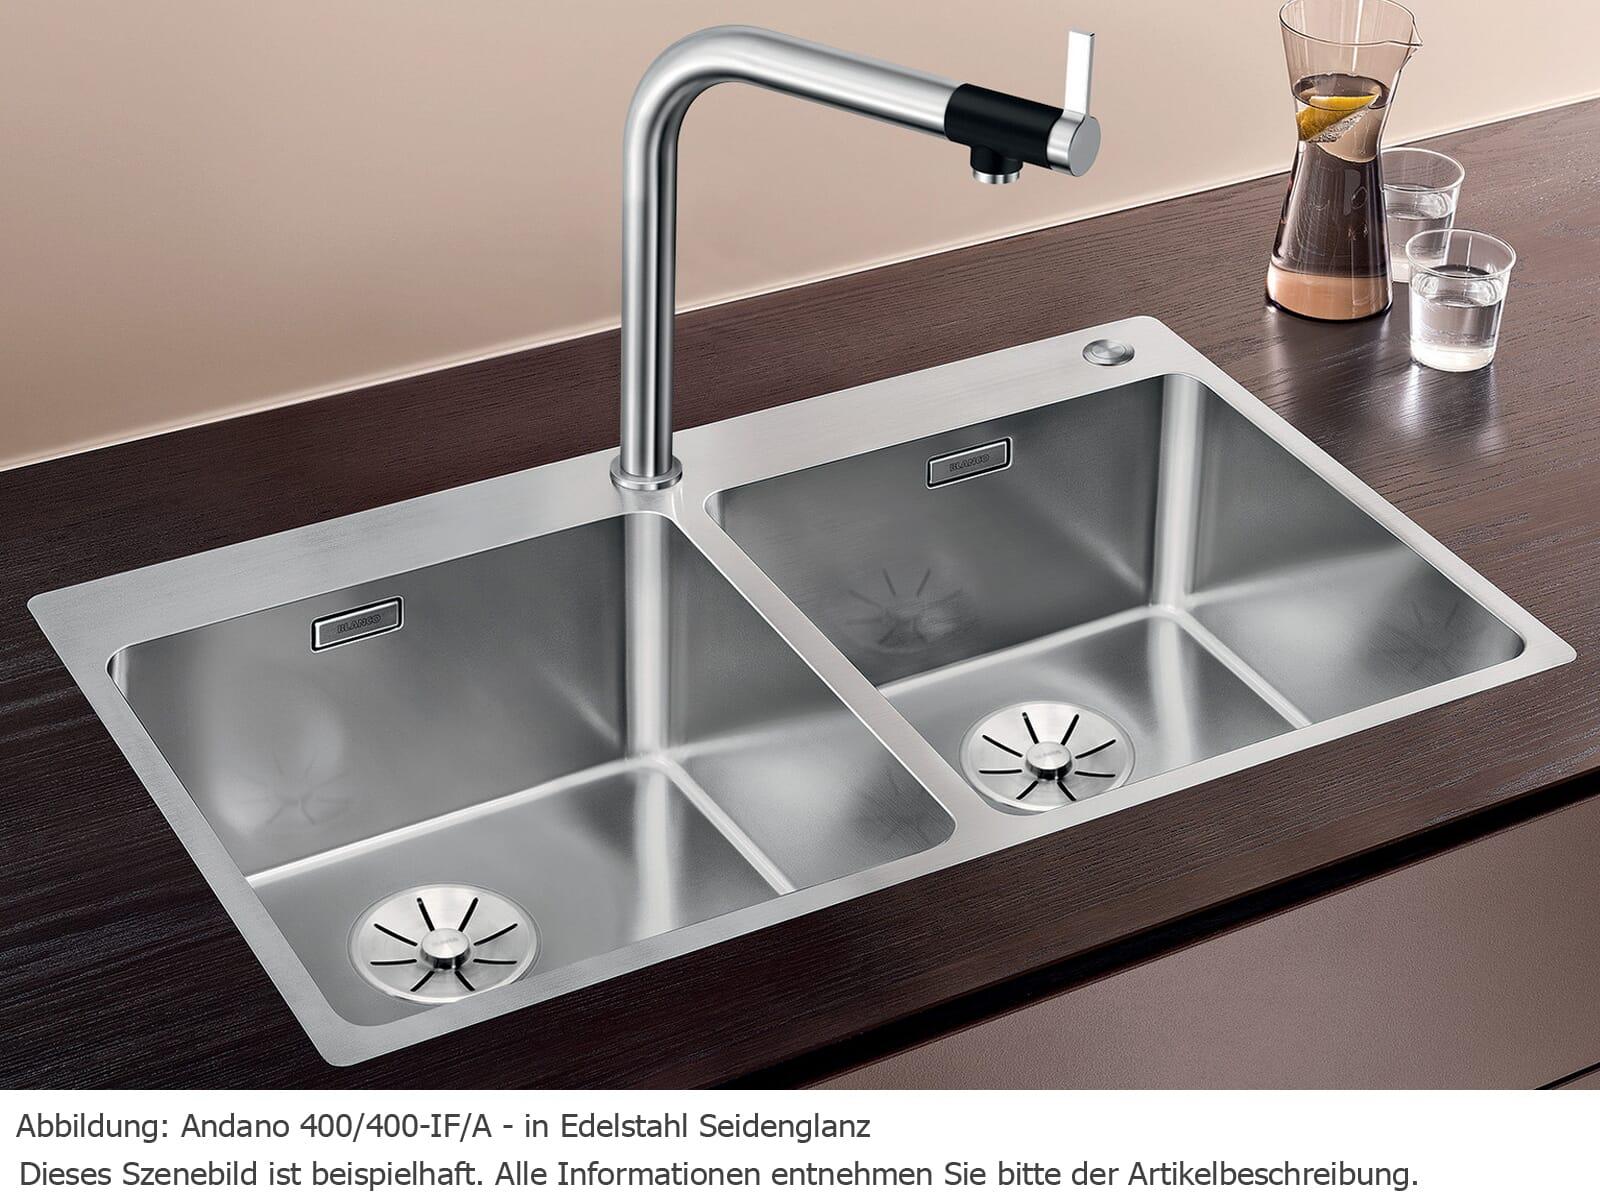 Blanco Andano 400/400-IF/A Edelstahlspüle Seidenglanz 525 249